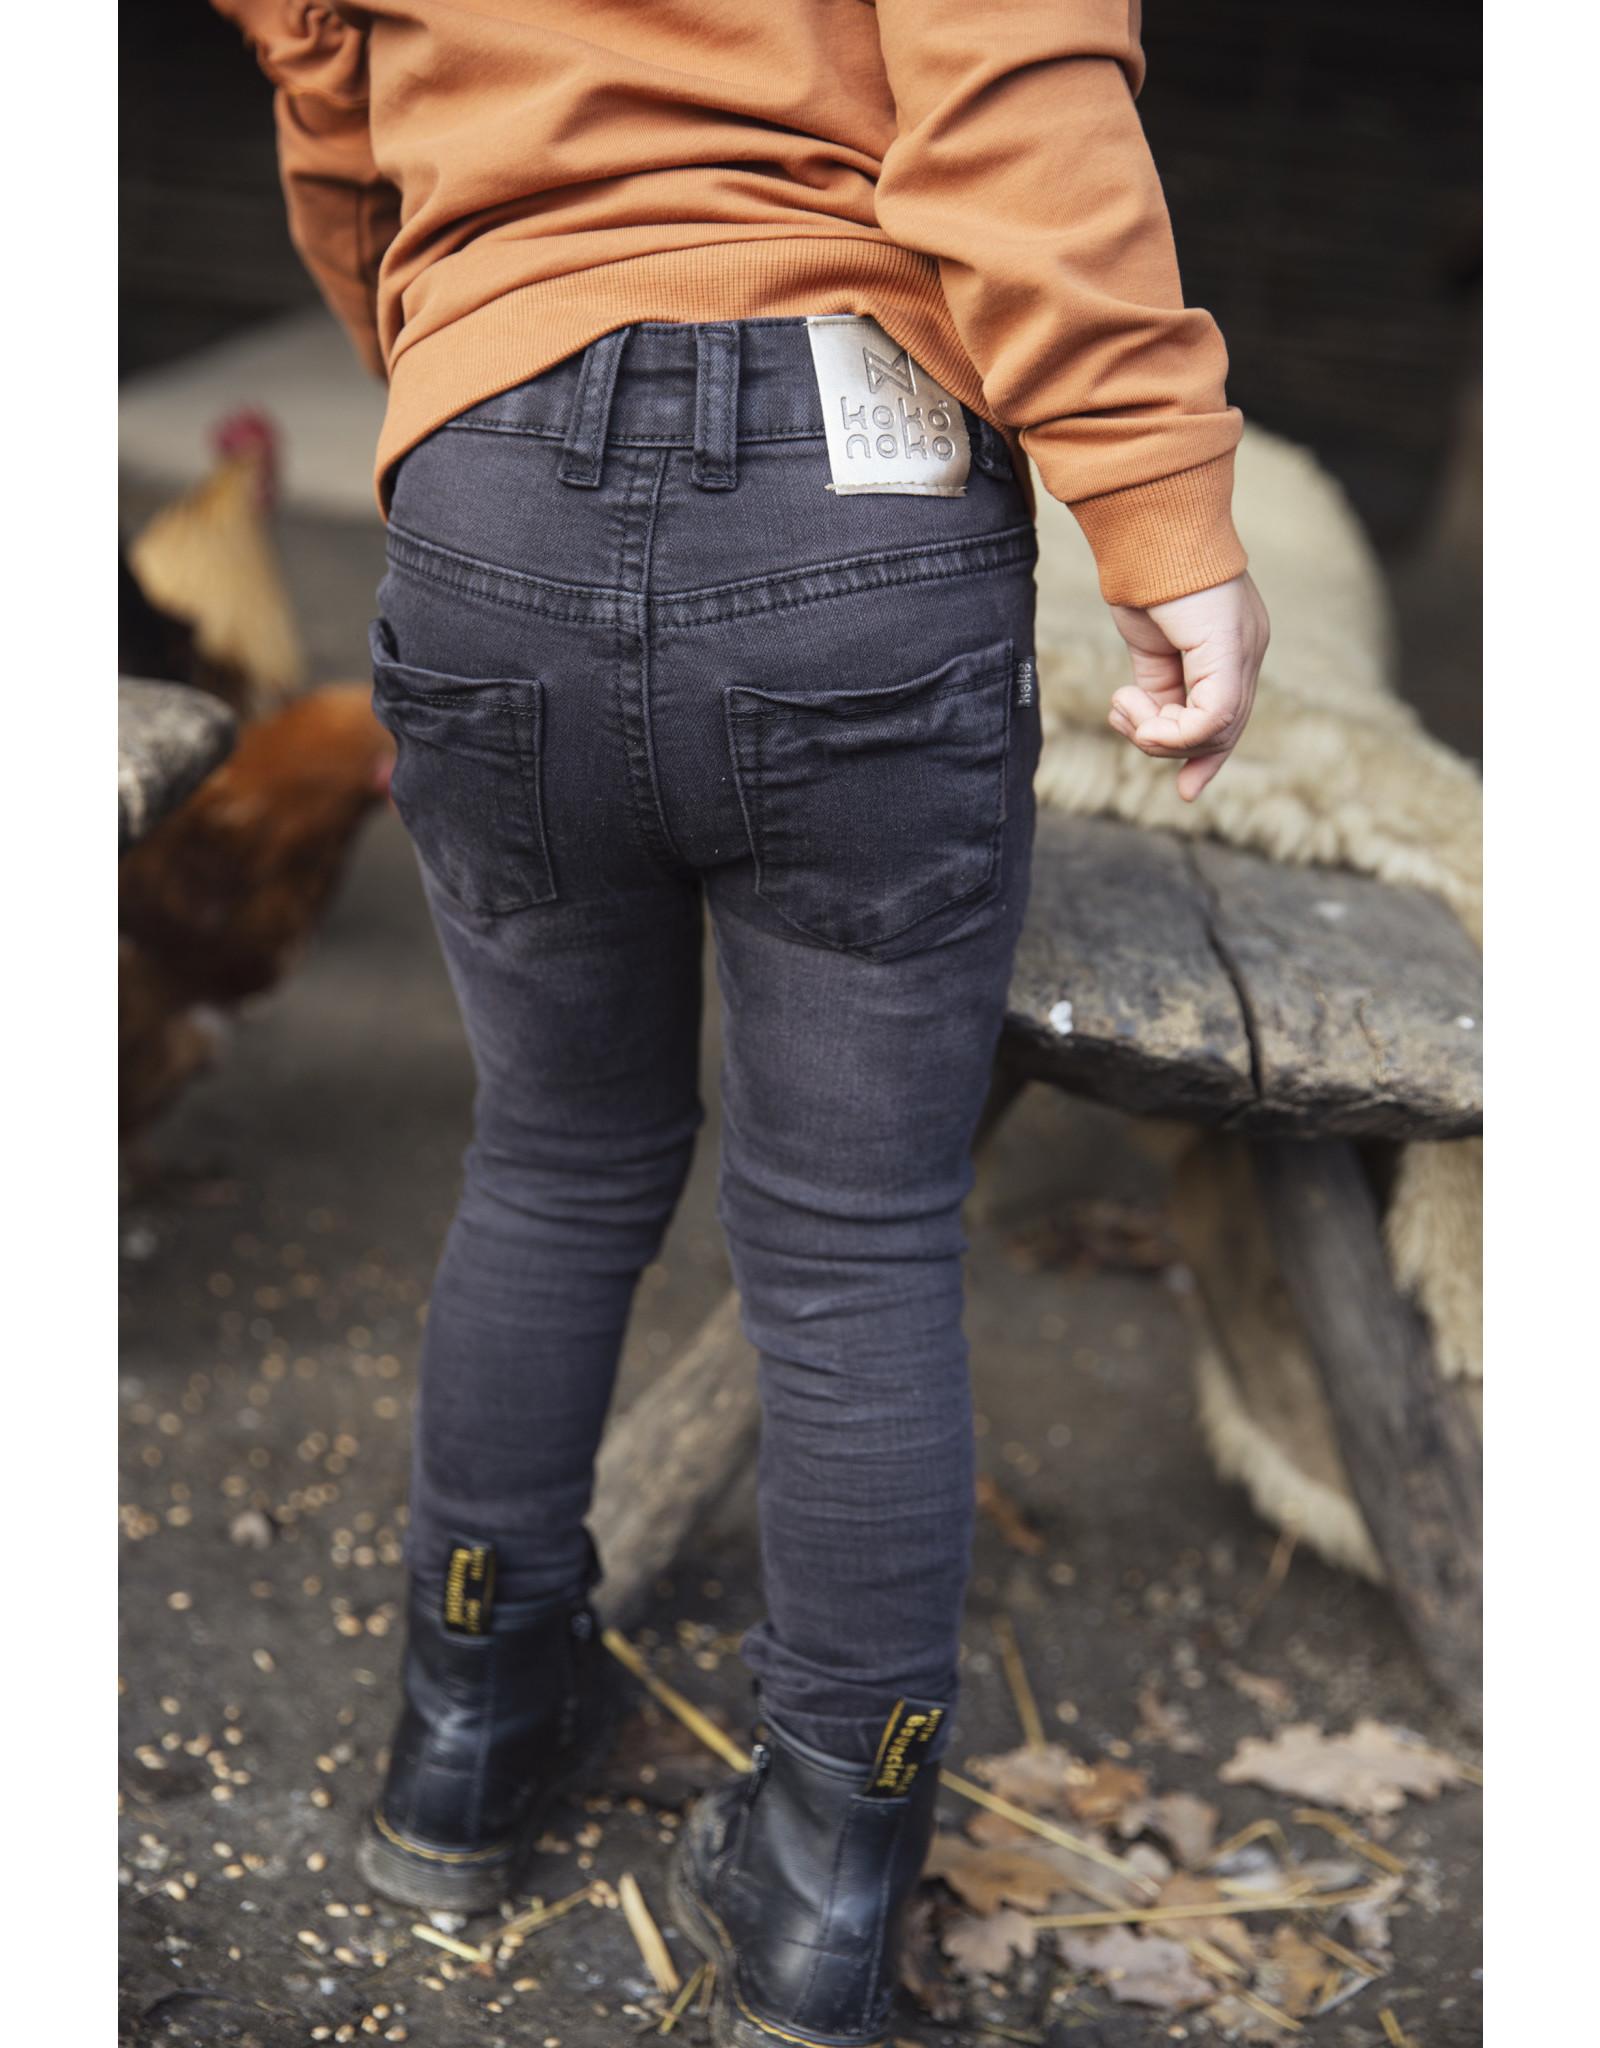 Koko Noko Girls Jeans Black